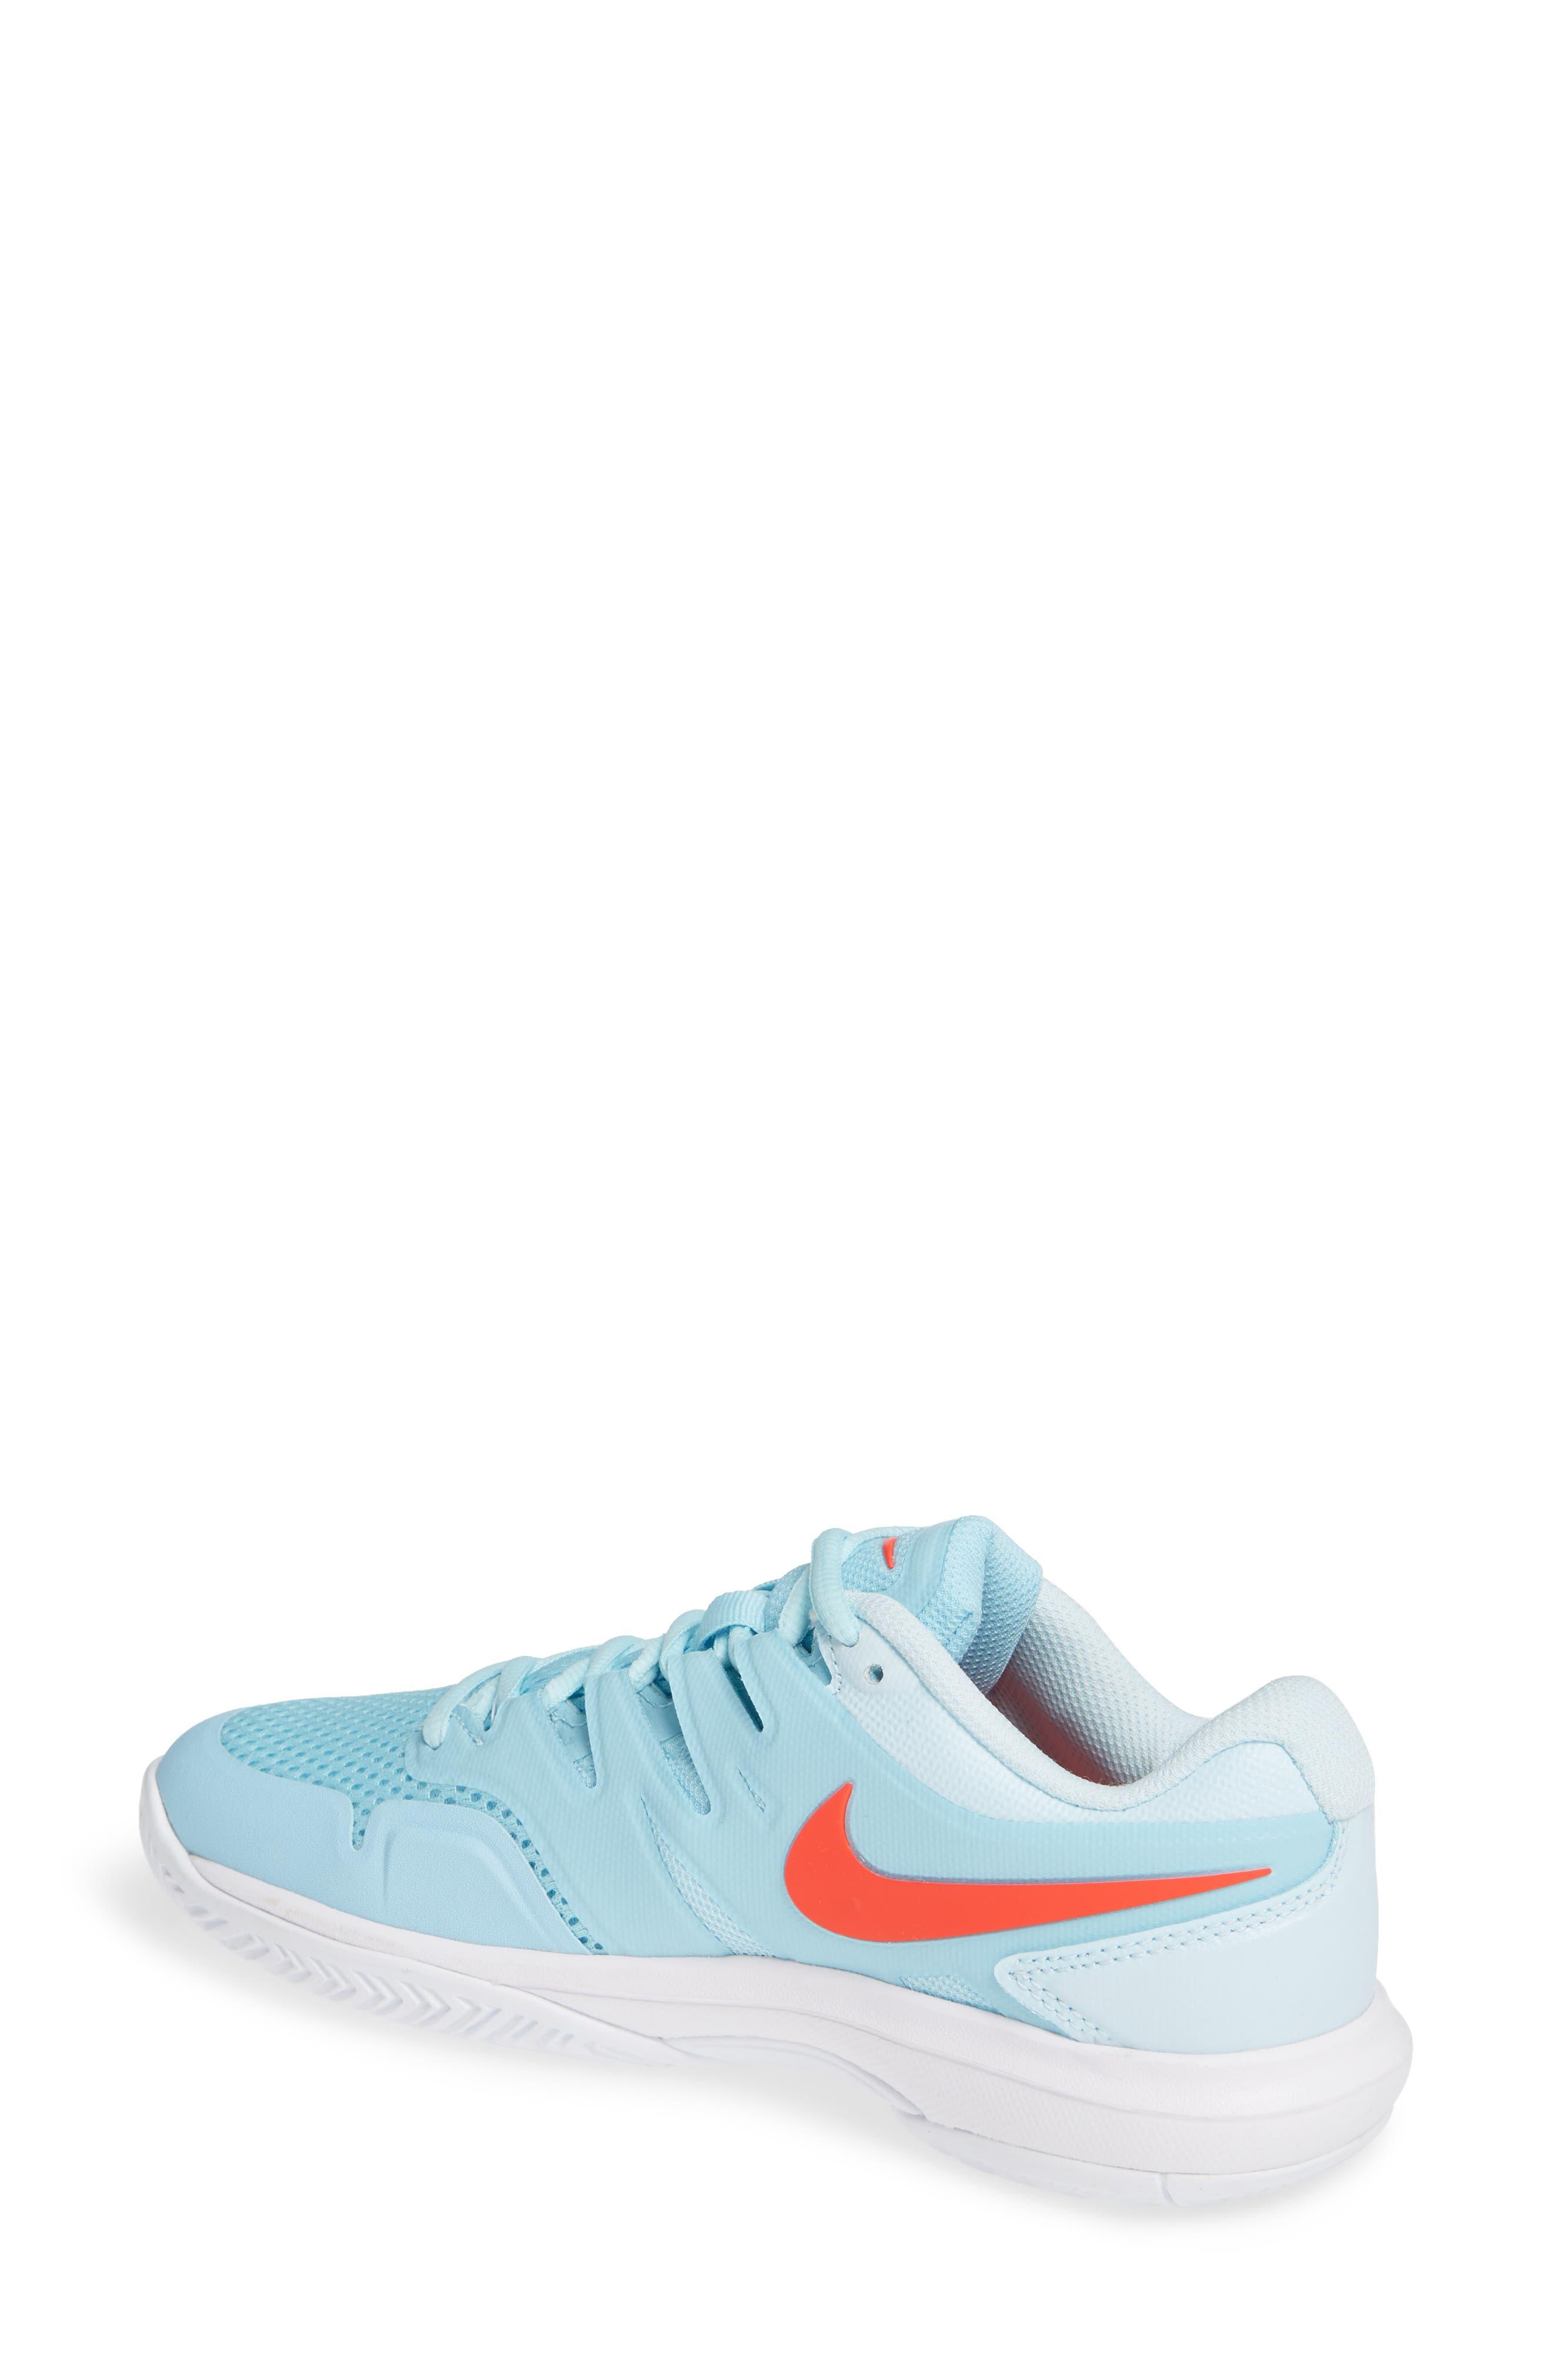 Air Zoom Prestige Tennis Shoe,                             Alternate thumbnail 2, color,                             BLUE/ BRIGHT CRIMSON-TOPAZ